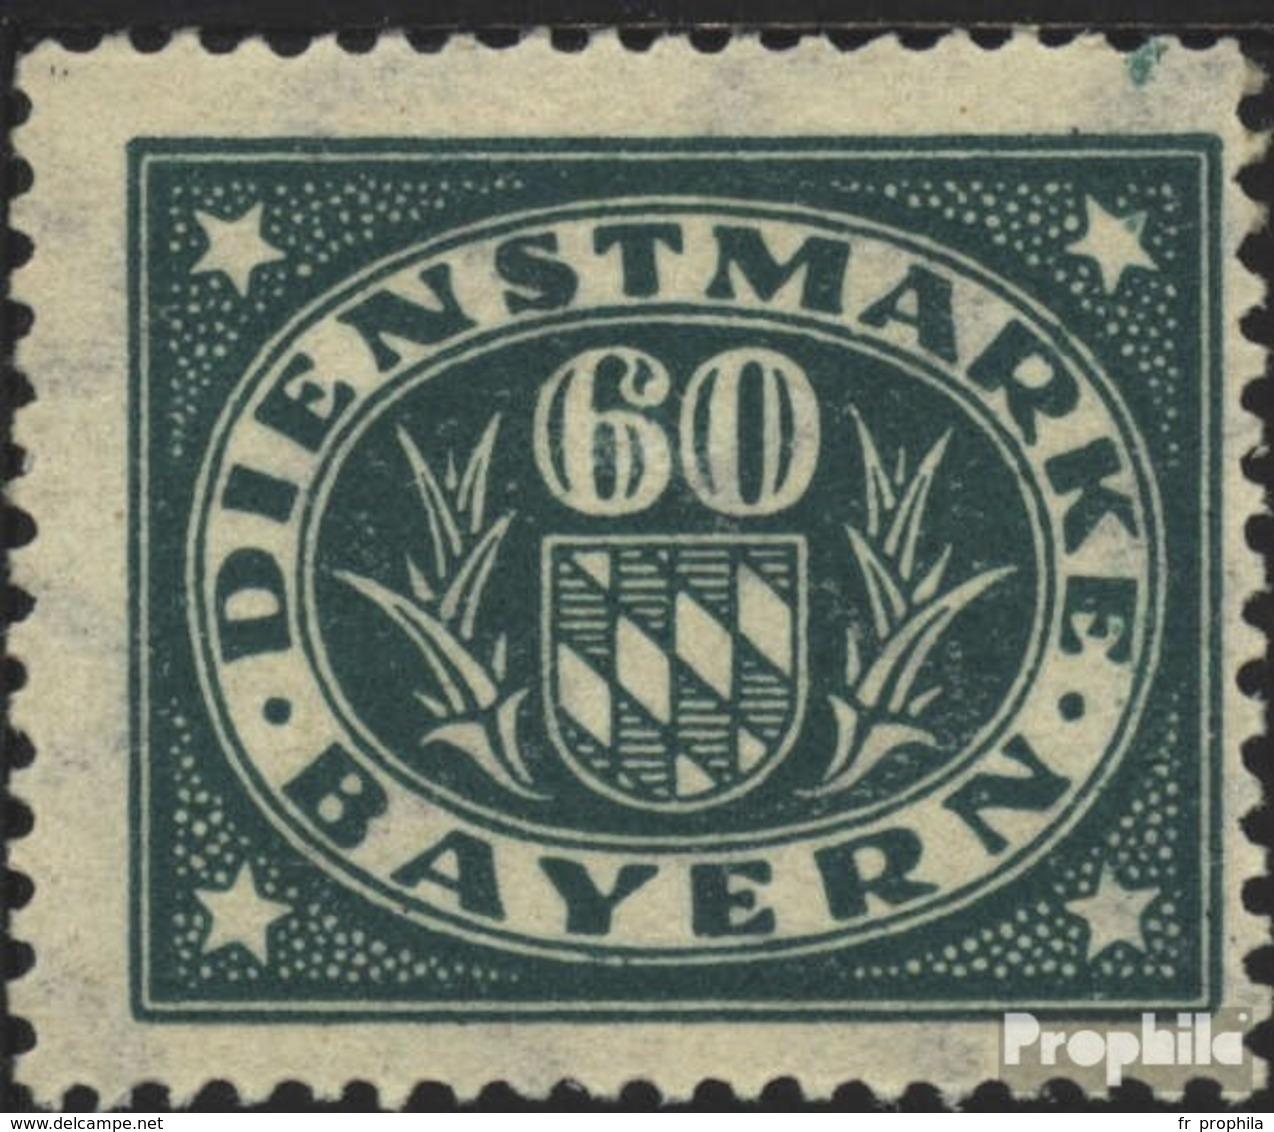 Bavière D51 Neuf Avec Gomme Originale 1920 Adieu La Série - Bayern (Baviera)